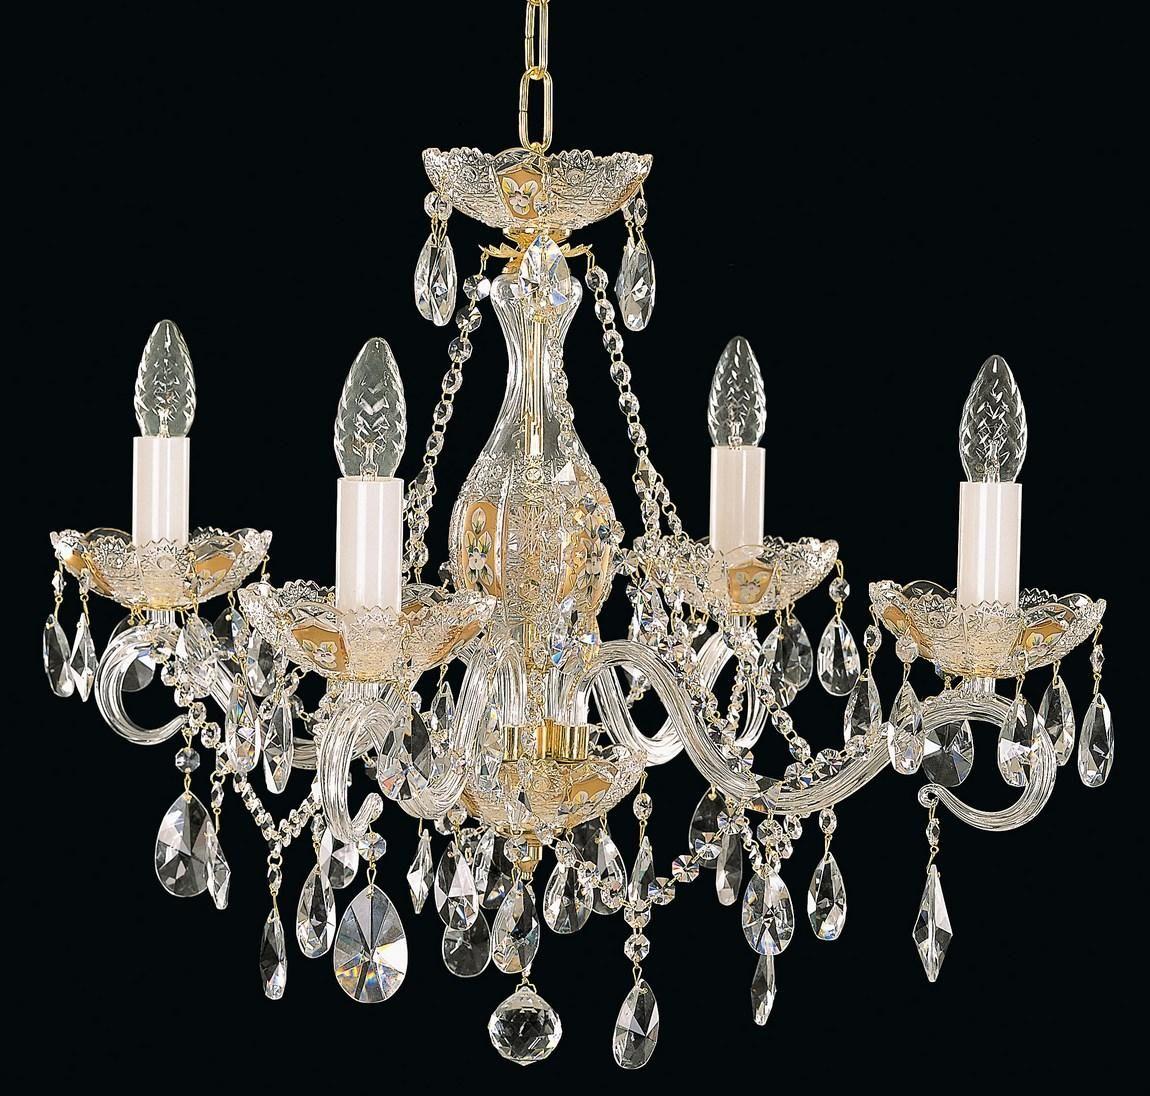 Cut crystal chandelier EL687402 | WALK IN CLOSETS | Pinterest ...